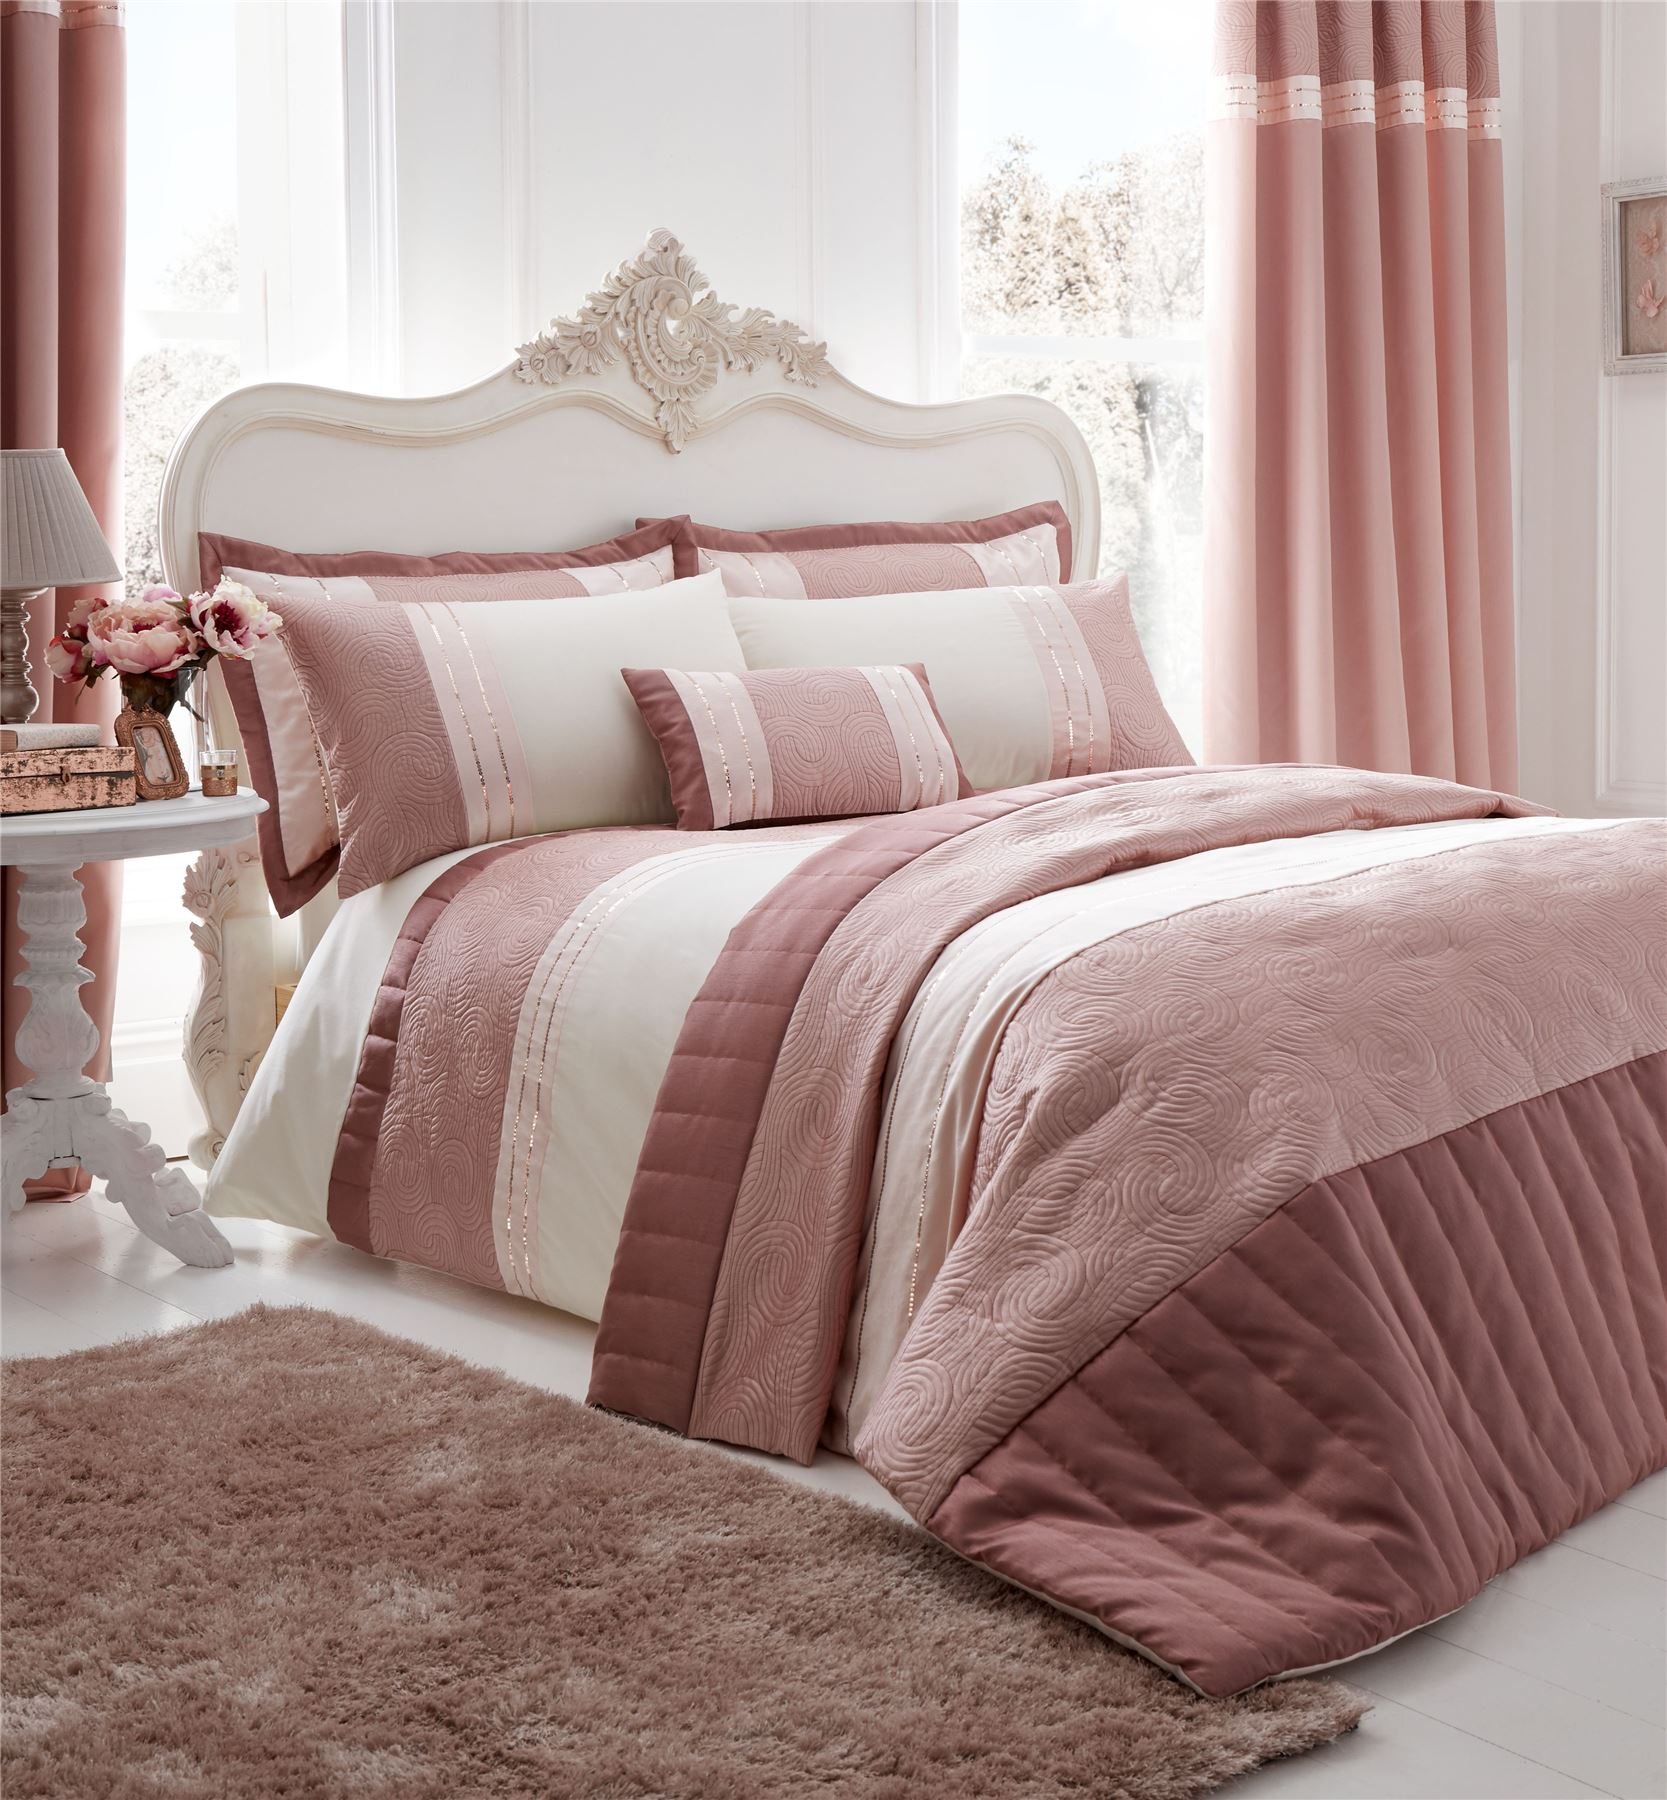 modern quilt duvet cover  pillowcase bed set or bedspread or  - modernquiltduvetcoveramppillowcasebedset